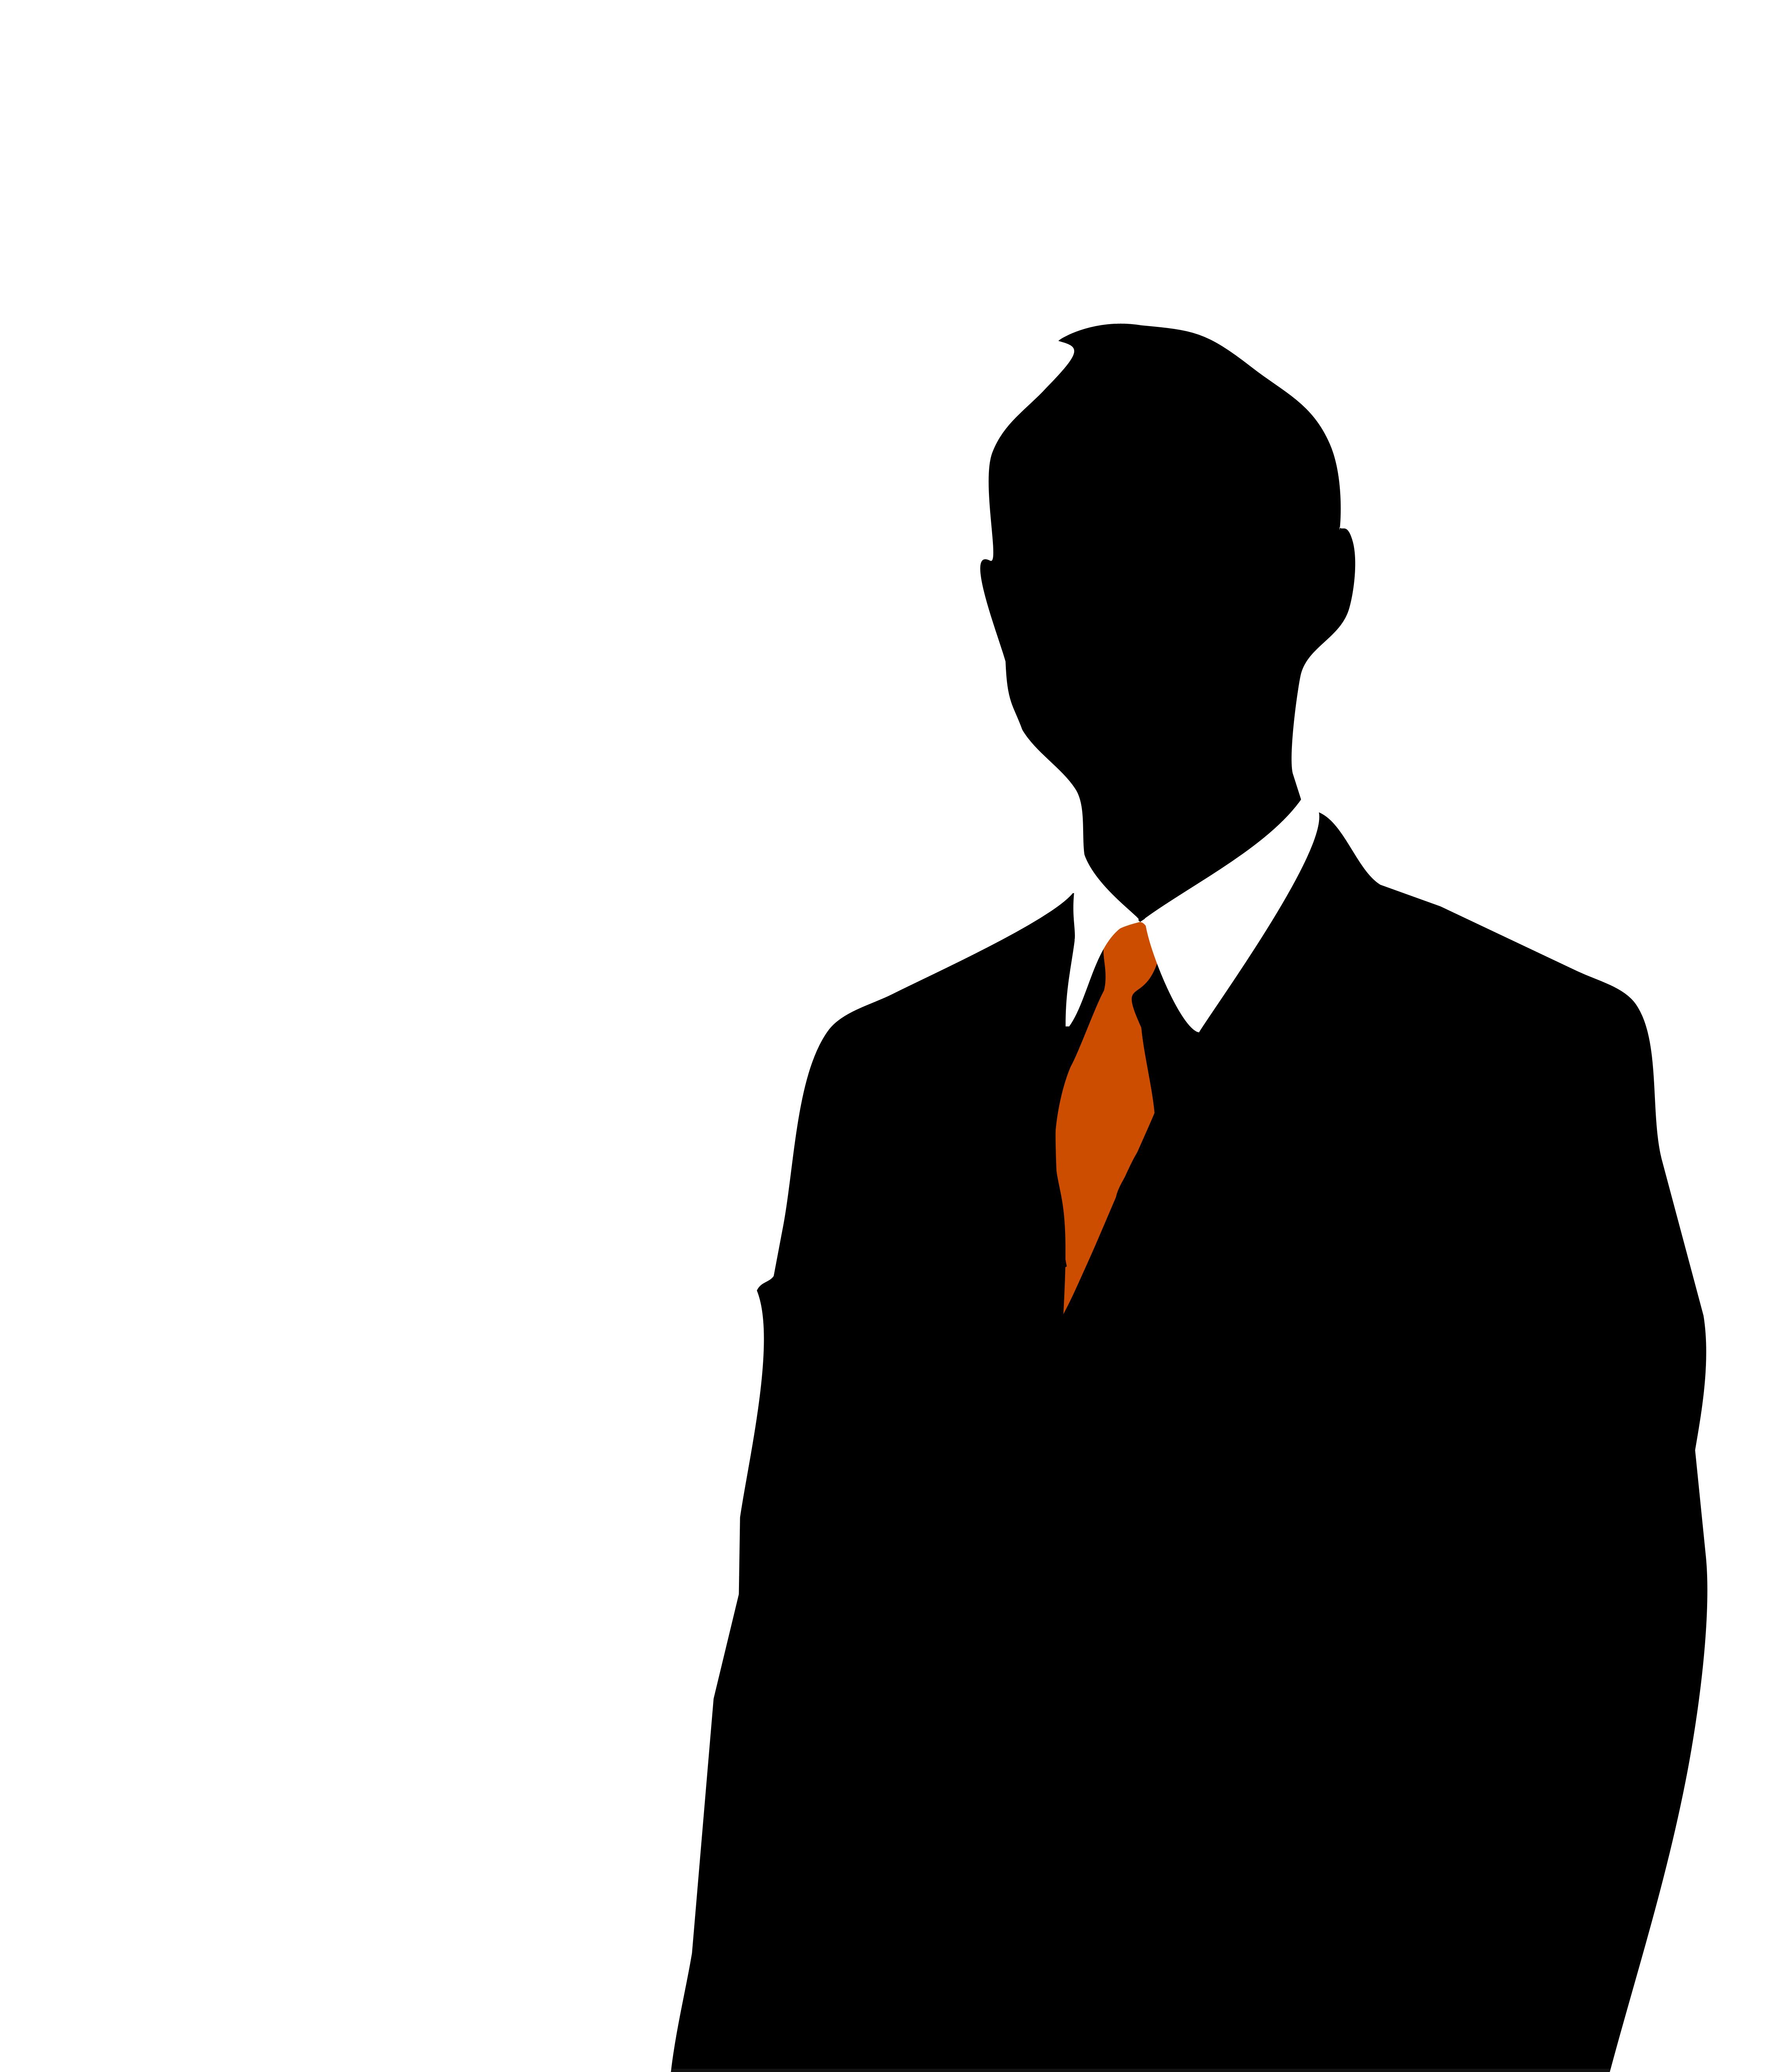 Prodata Consult - Lederpotentiale?